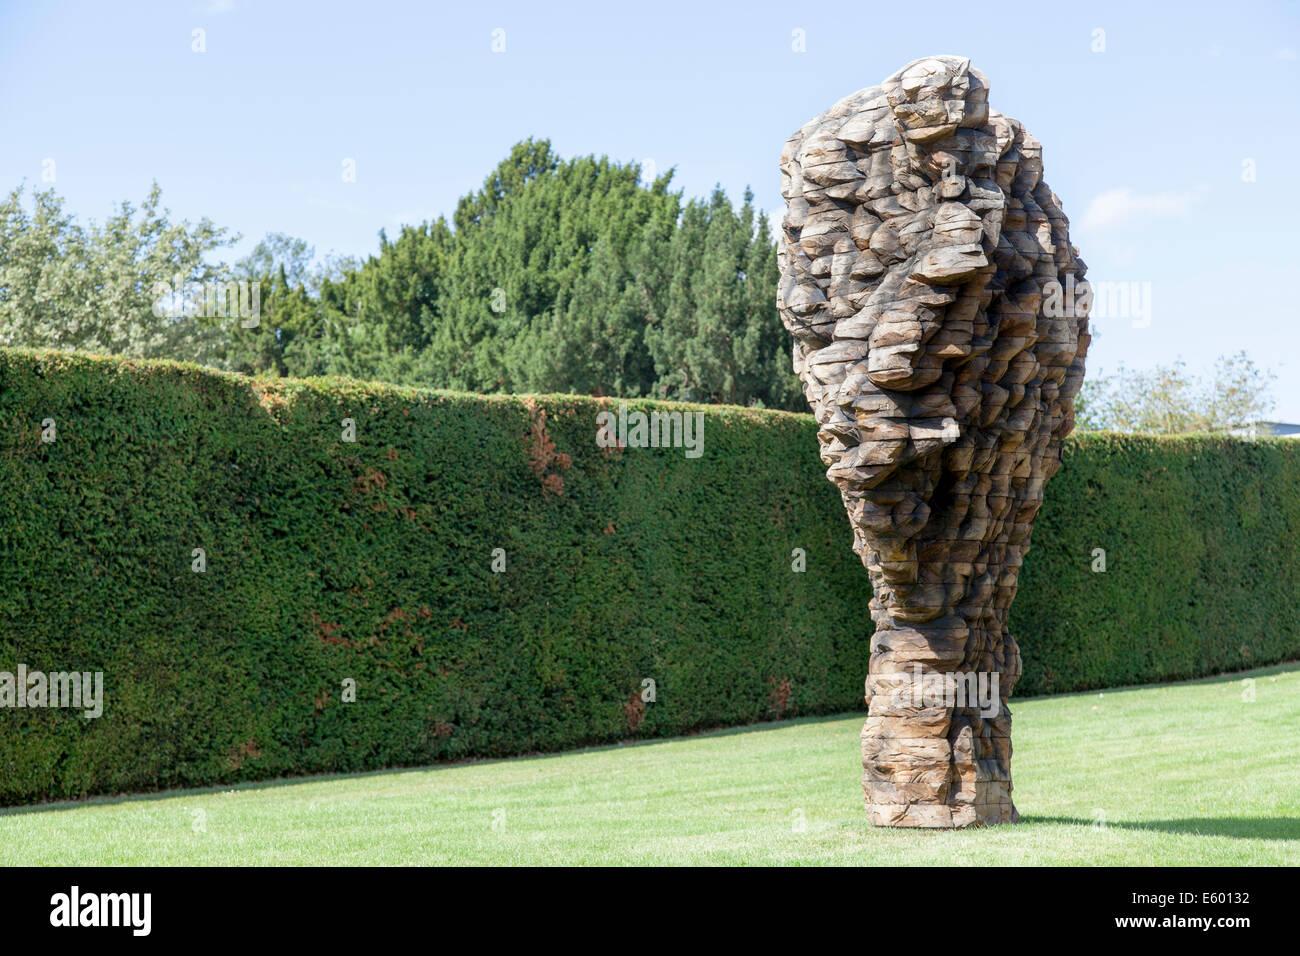 Sculpture titled  forScratch by Ursula von Rydingsvard  at Yorkshire Sculpture Park - Stock Image